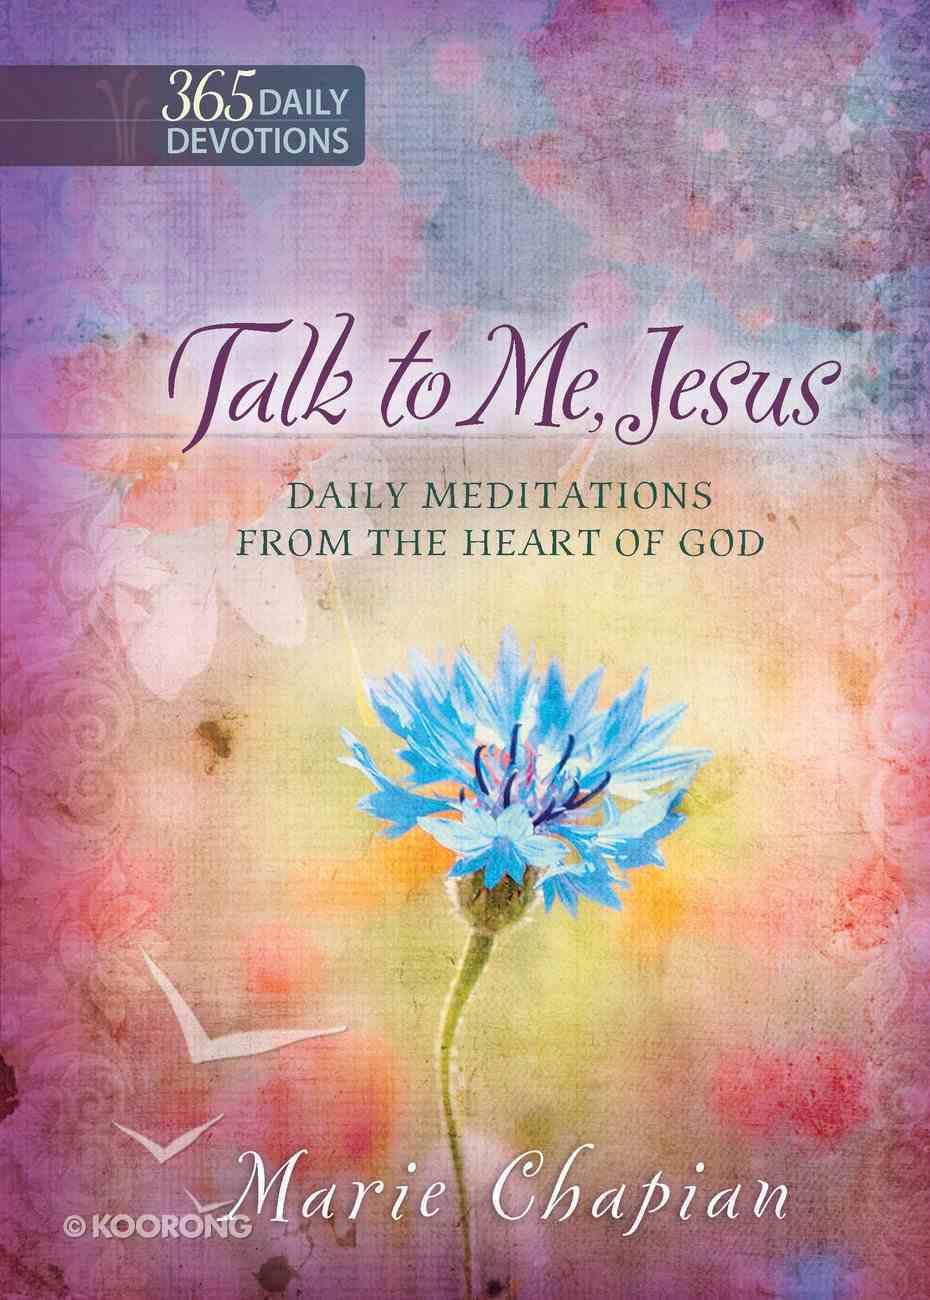 Talk to Me Jesus (365 Daily Devotions Series) eBook